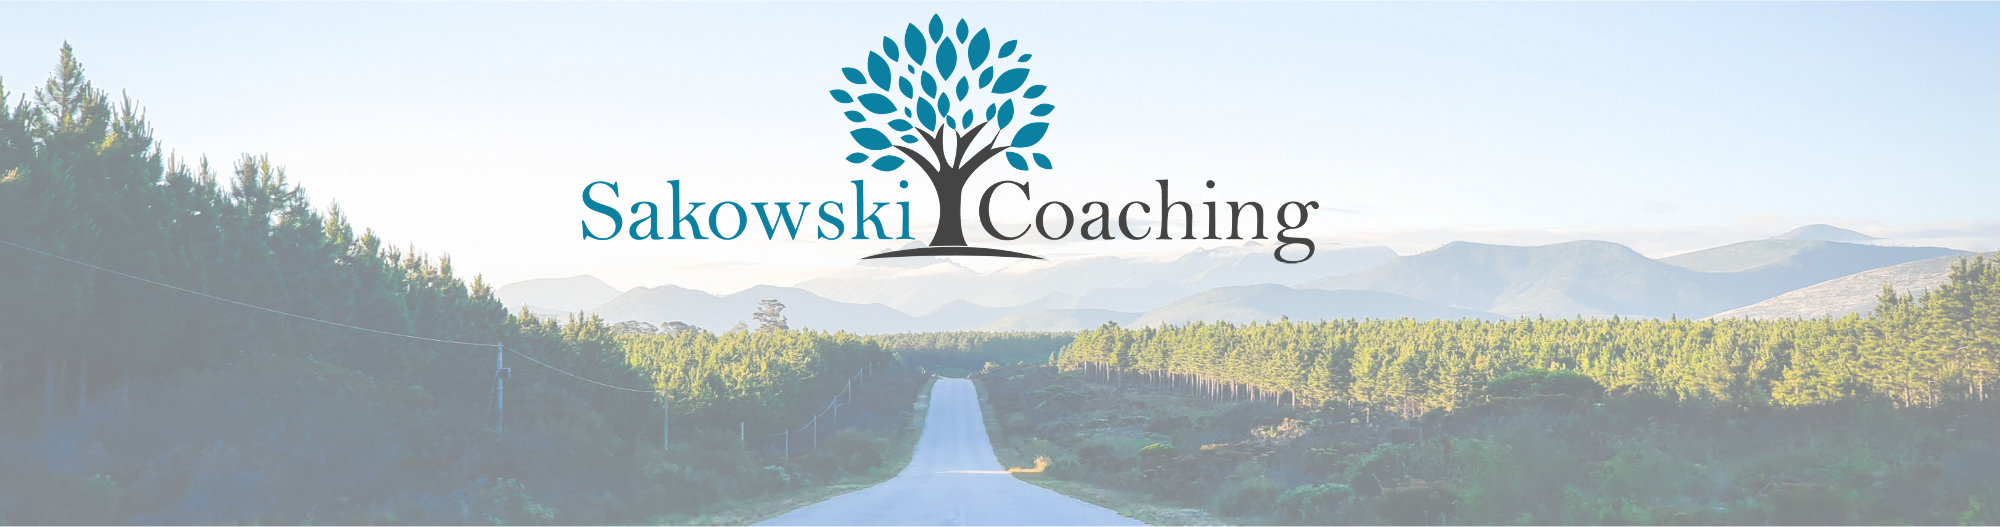 Sakowski-Coaching